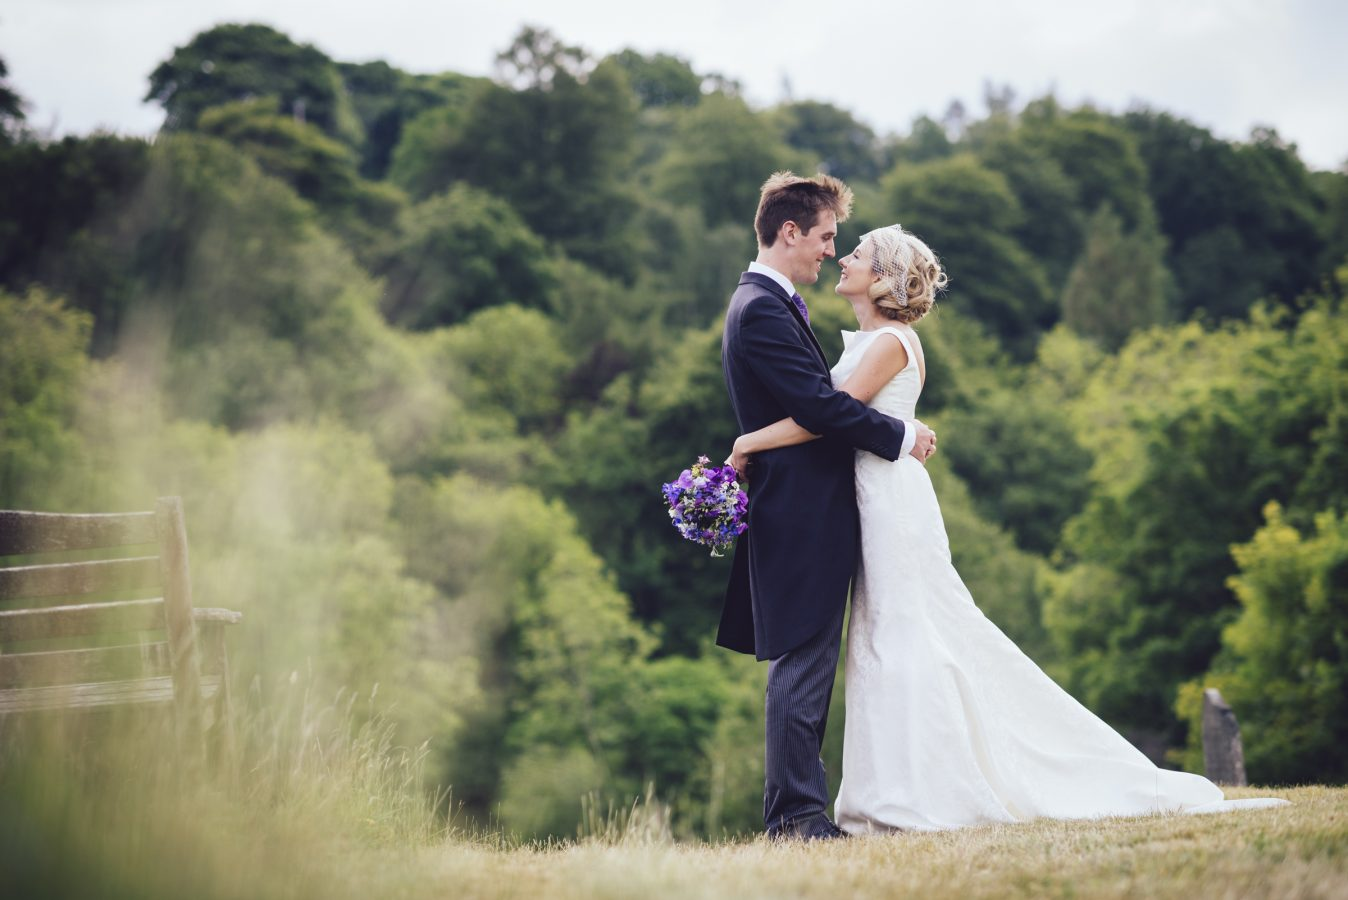 Wedding photographer in Preston, Lancashire